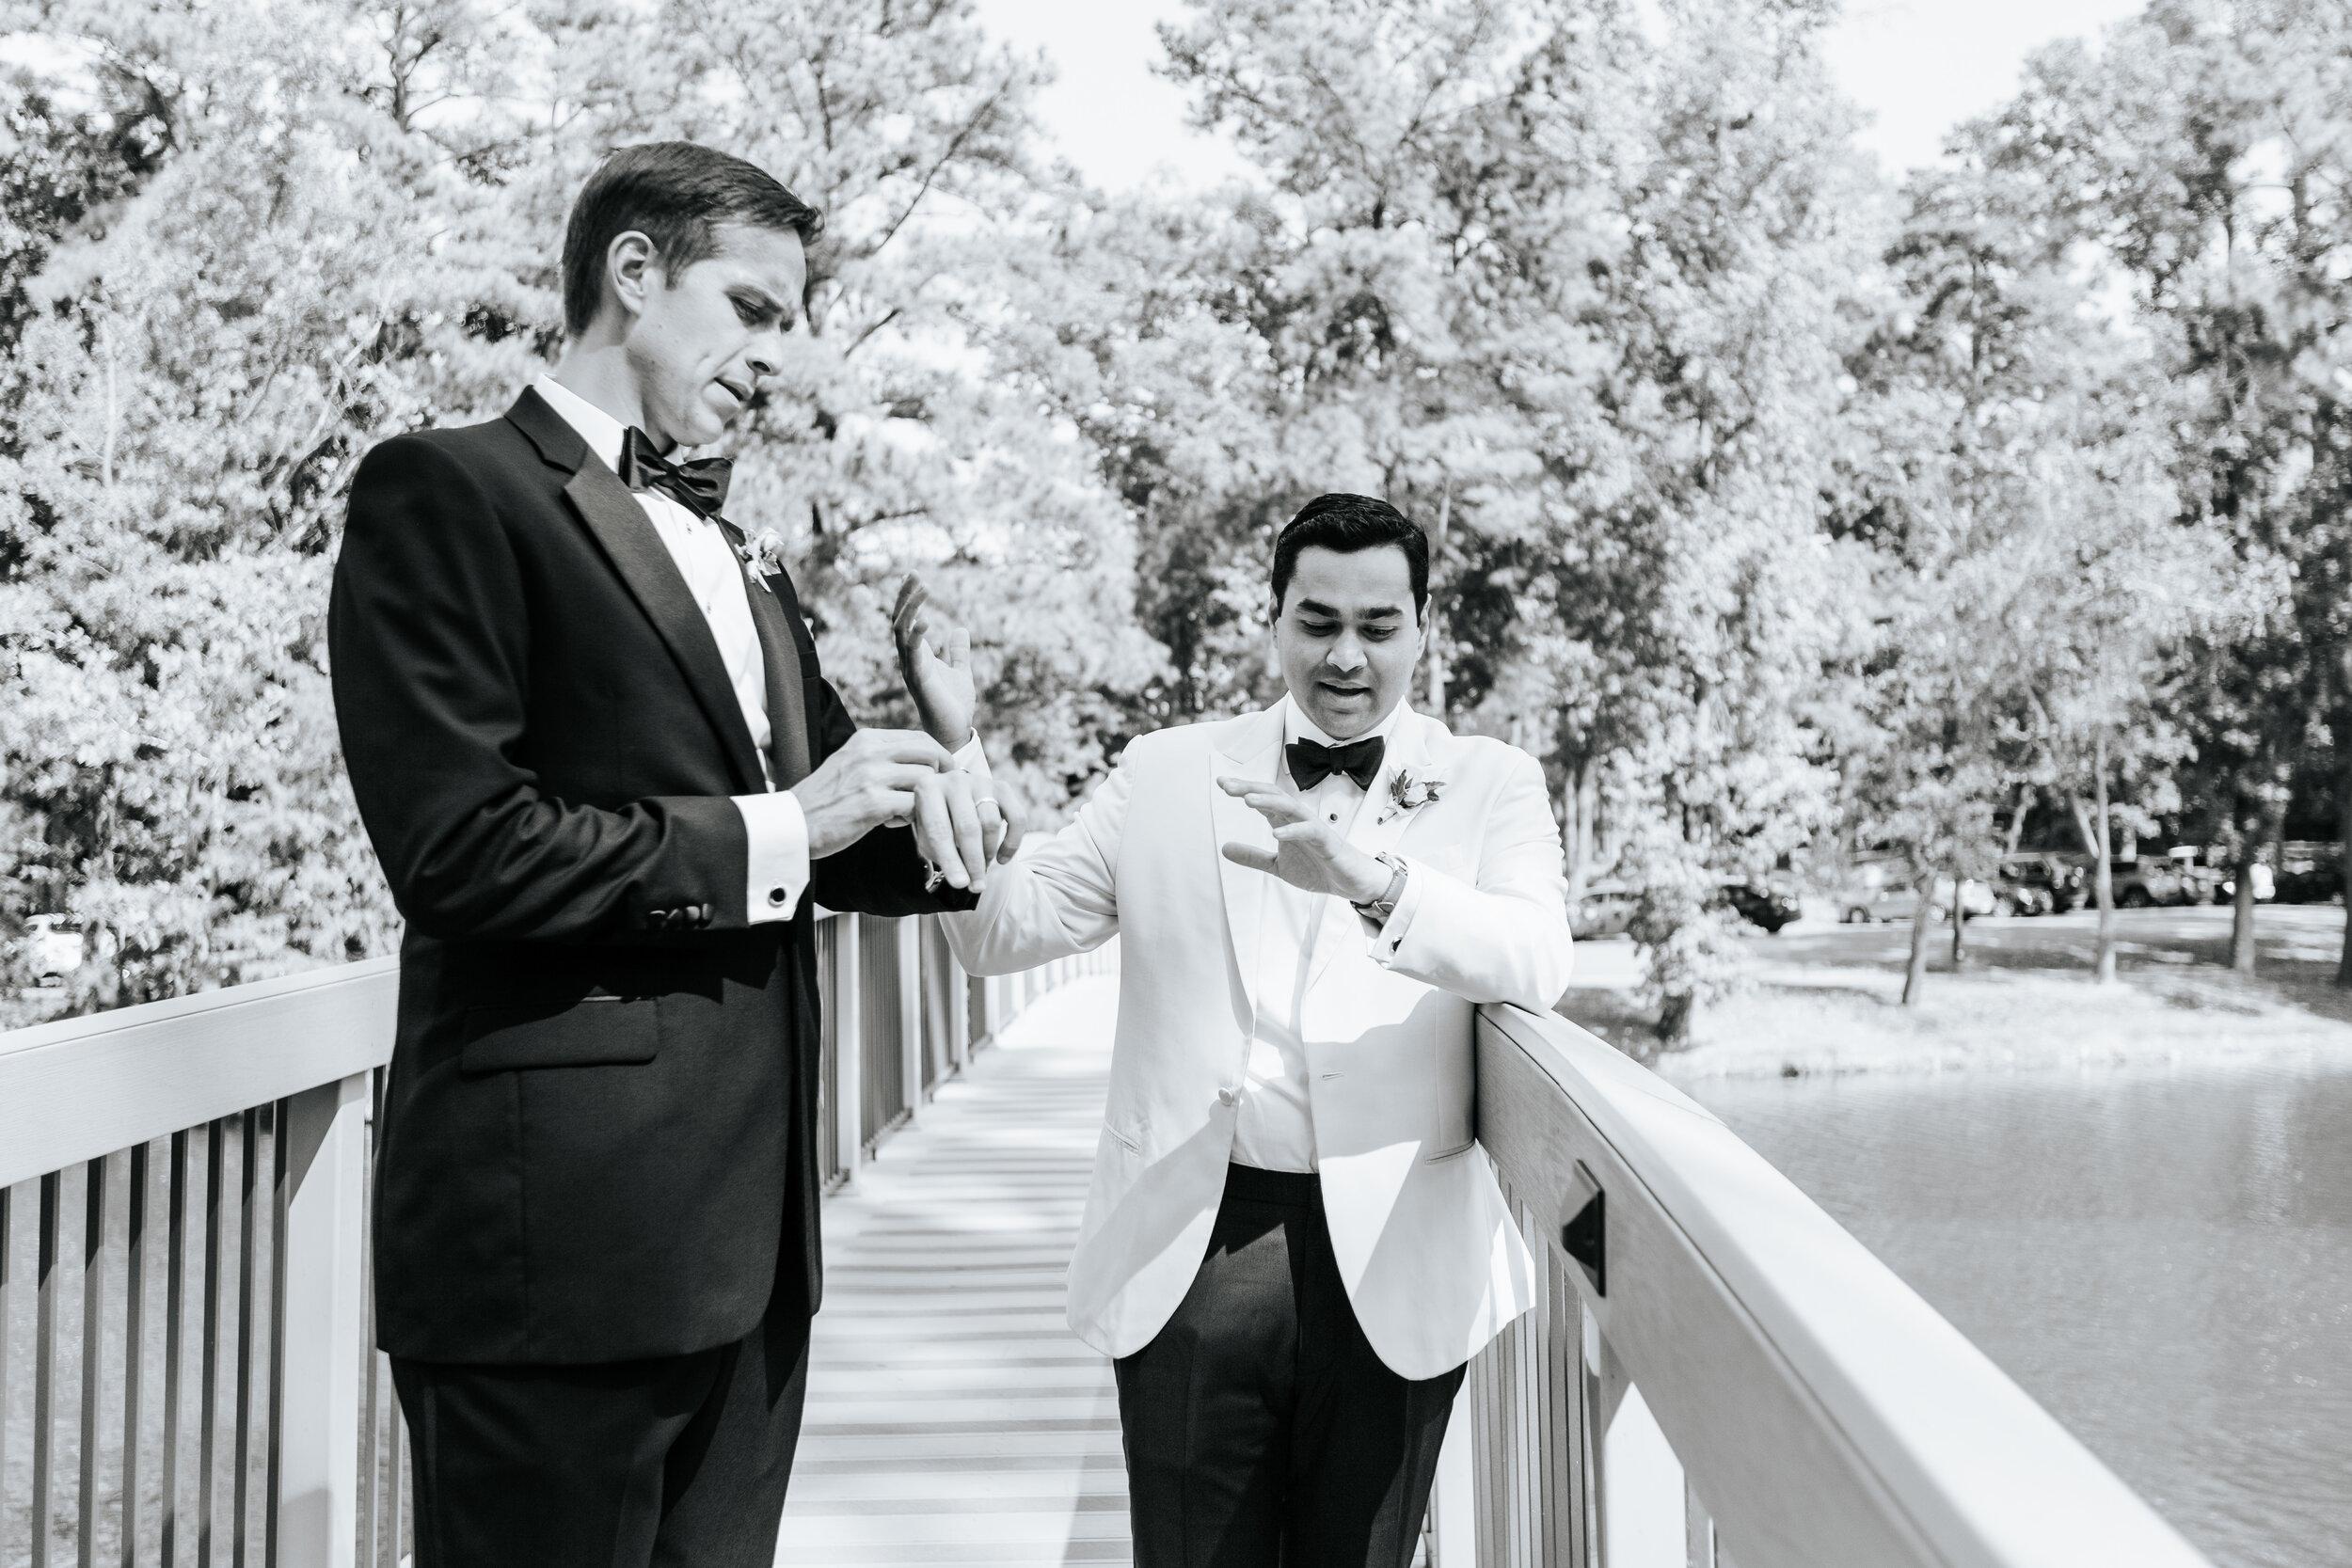 Cassie-Mrunal-Wedding-Quirk-Hotel-John-Marshall-Ballrooms-Richmond-Virginia-Photography-by-V-34.jpg